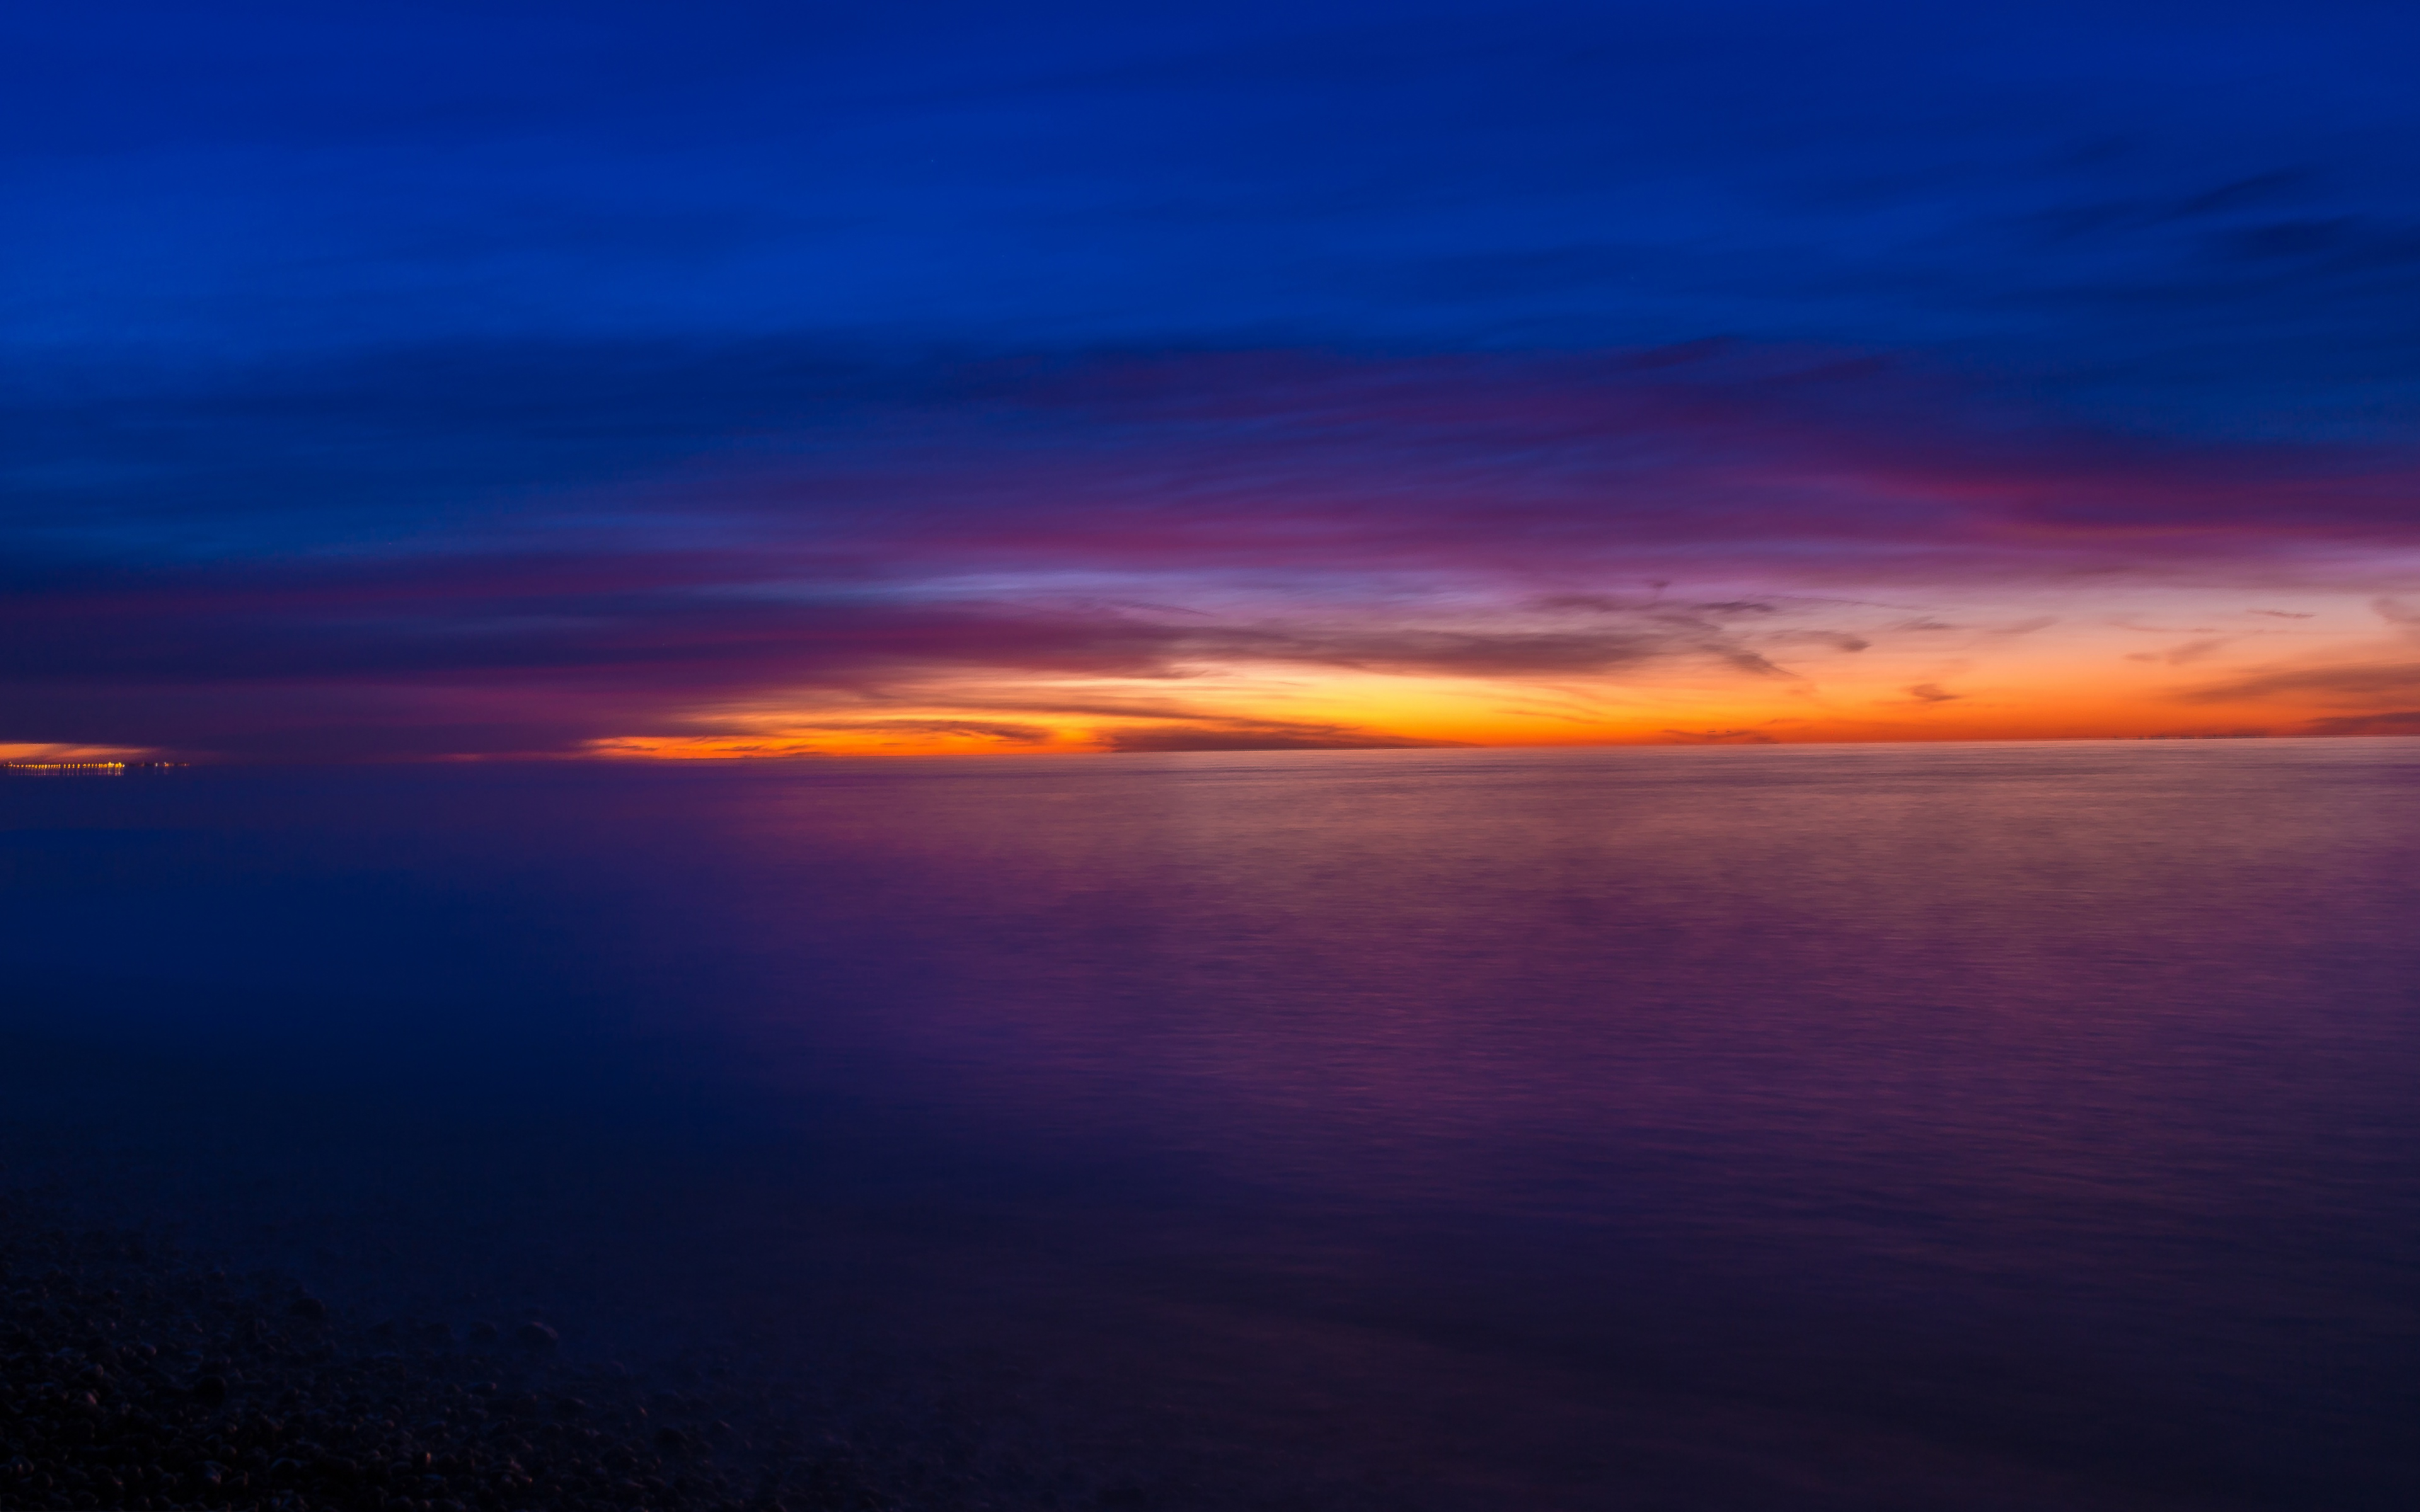 Ocean sunset sky